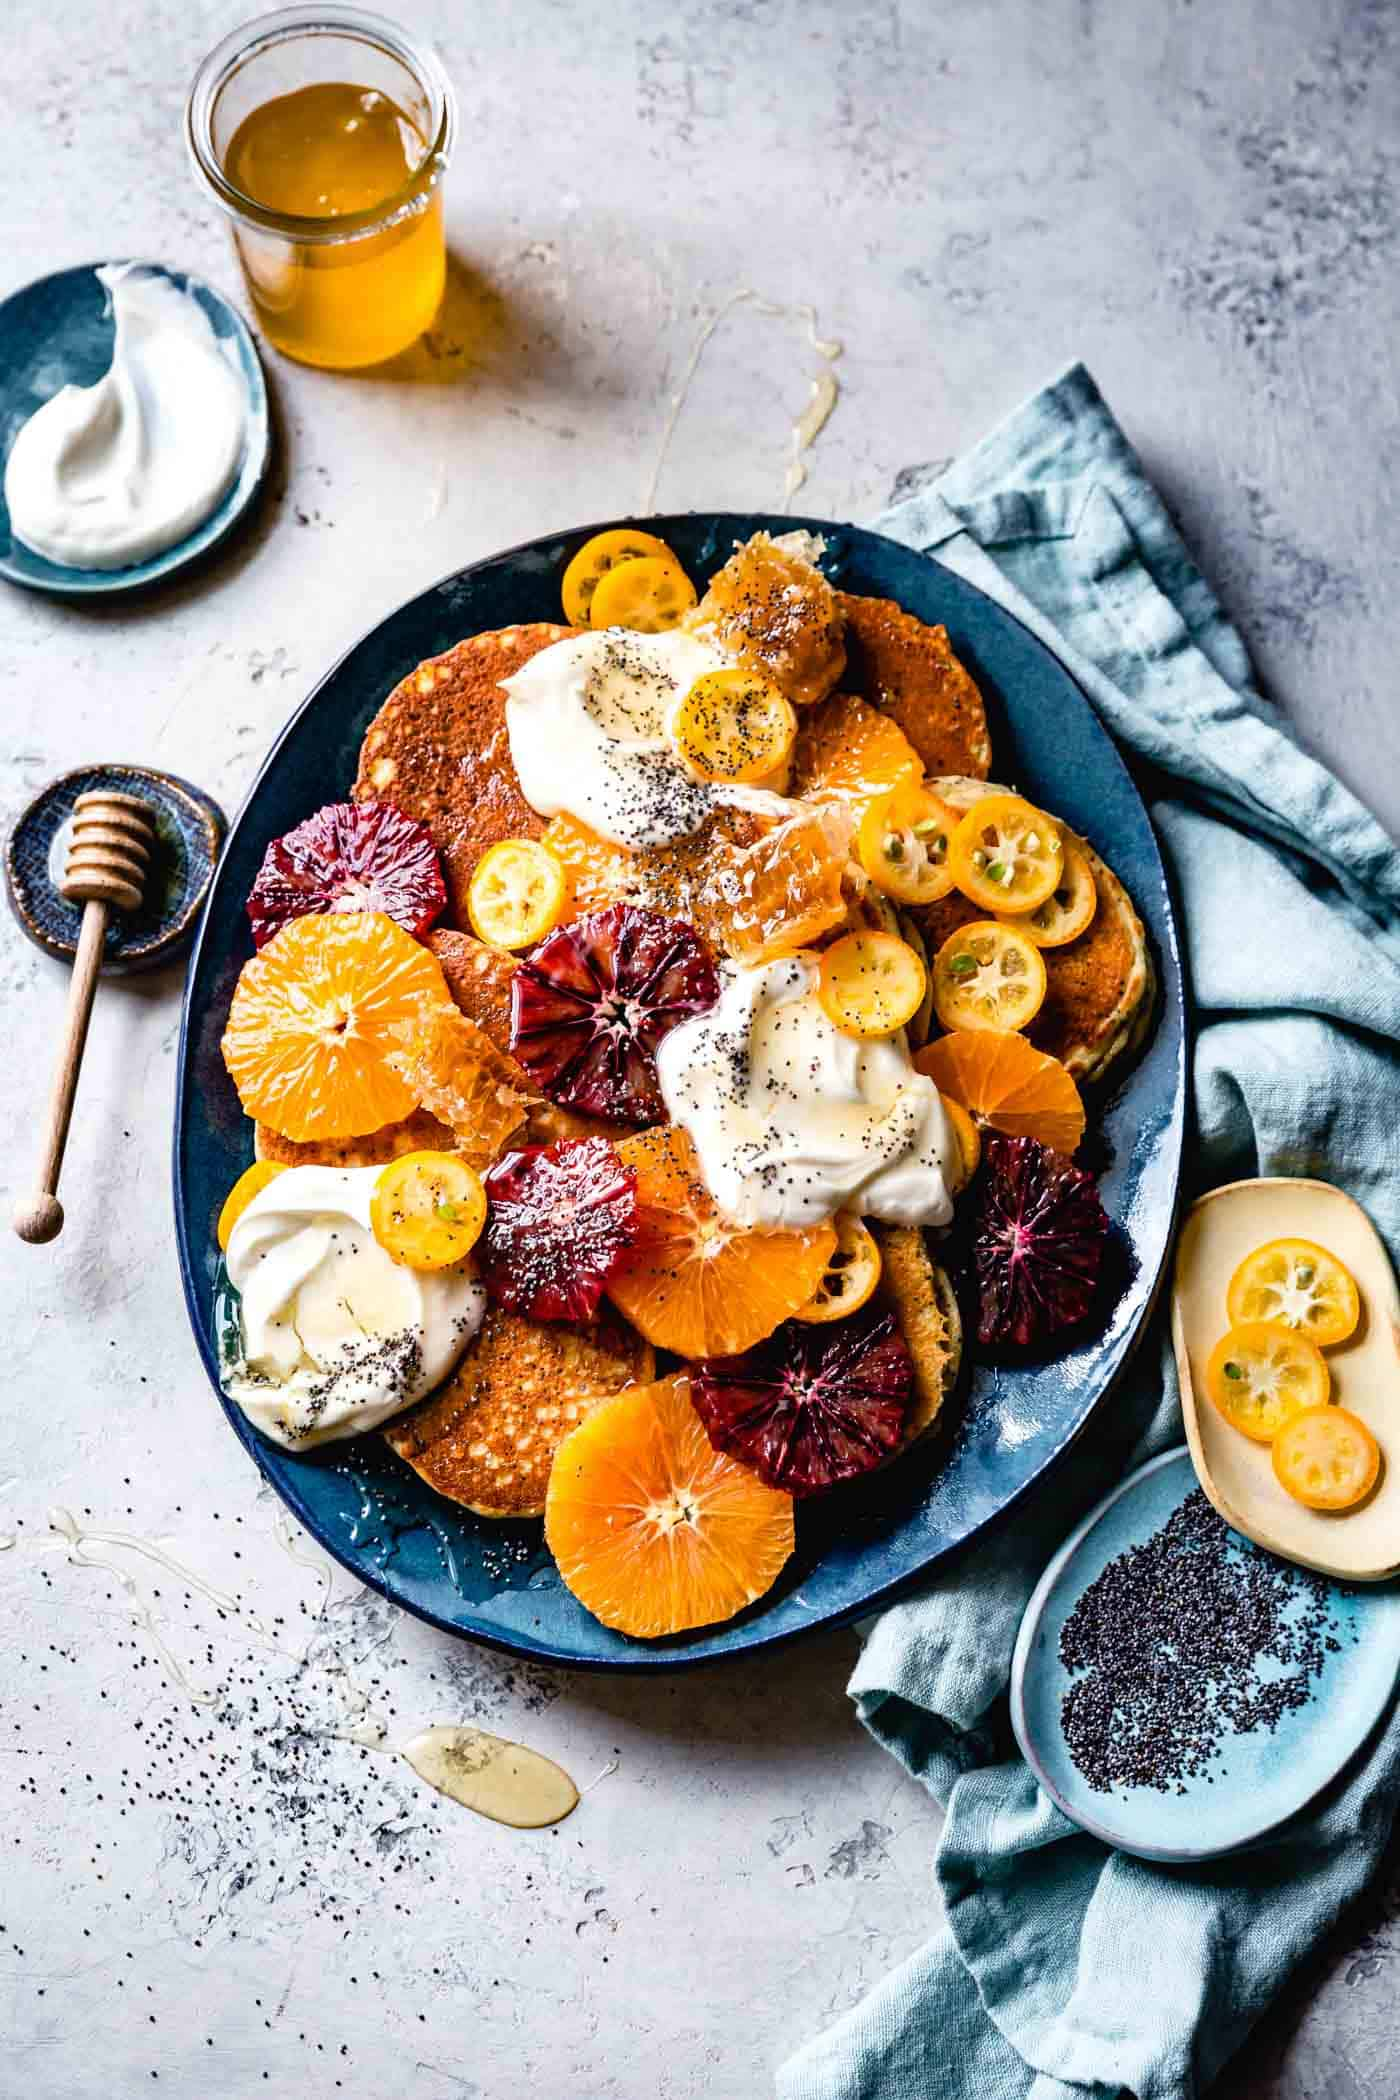 Platter of gluten-free almond flour pancakes with yogurt, citrus, honey, and poppy seeds